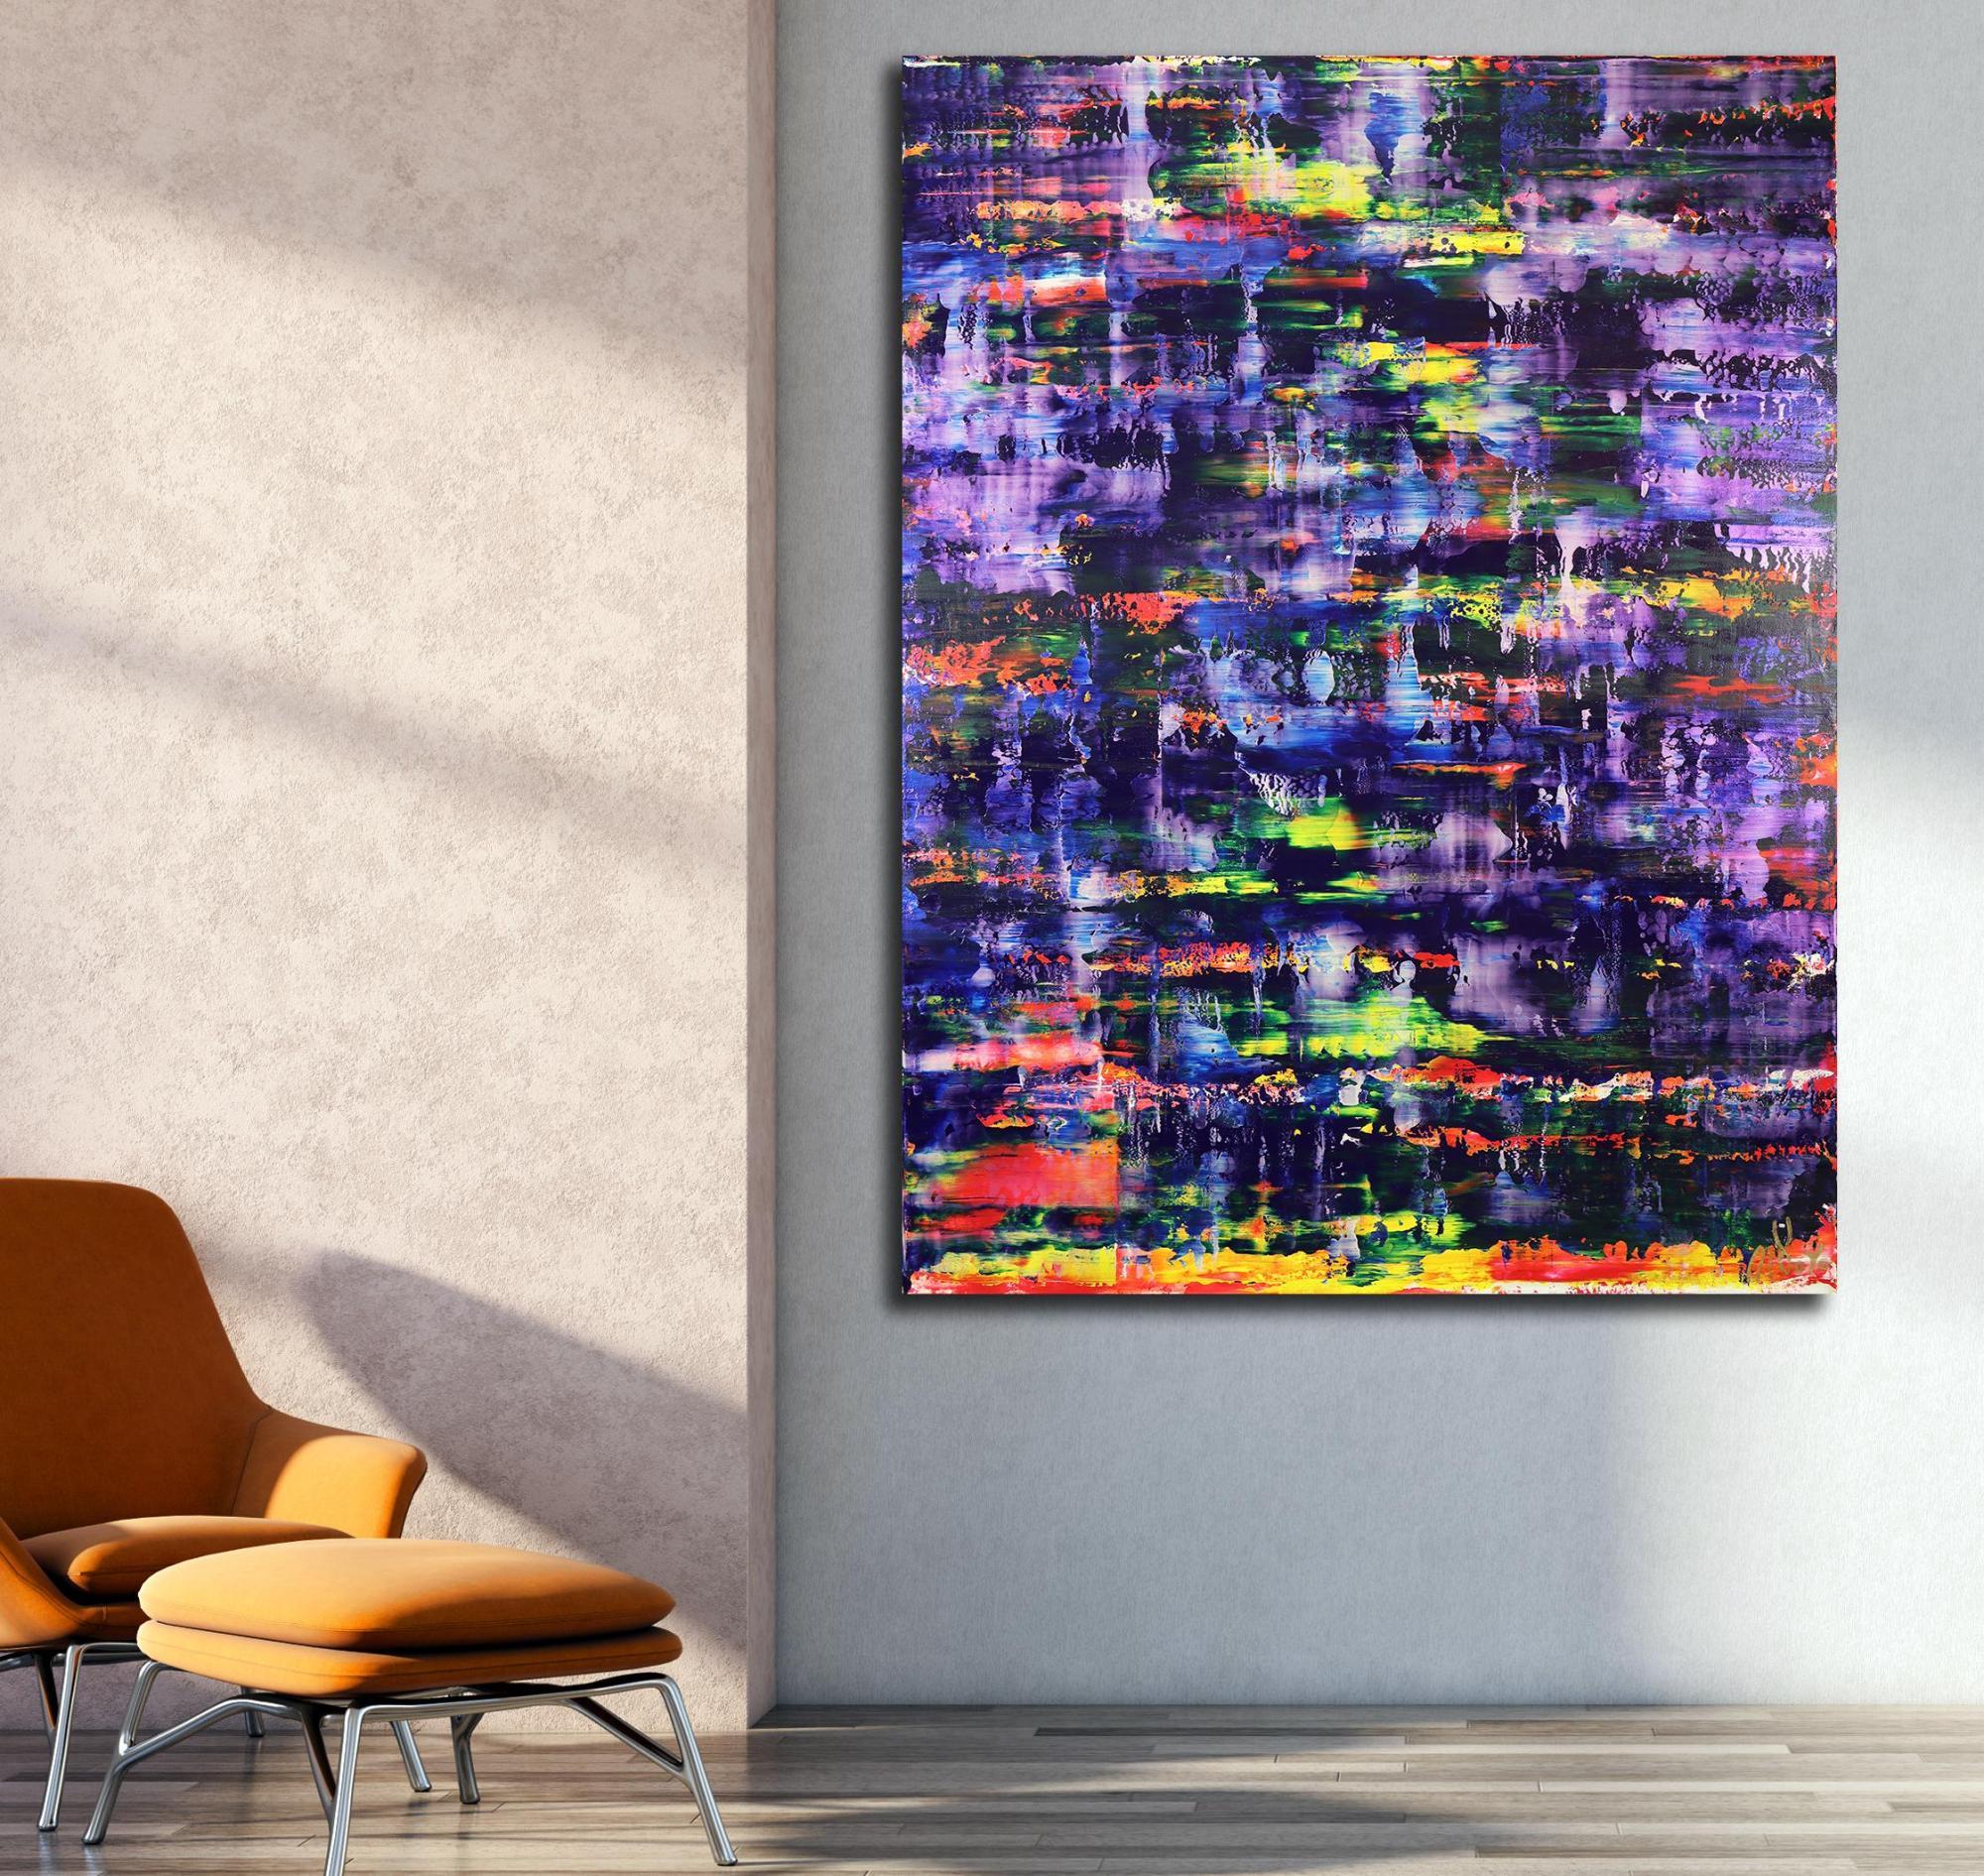 Blue Shade Panorama (Purple Radiance) (2021) / Room example / Artist: Nestor Toro